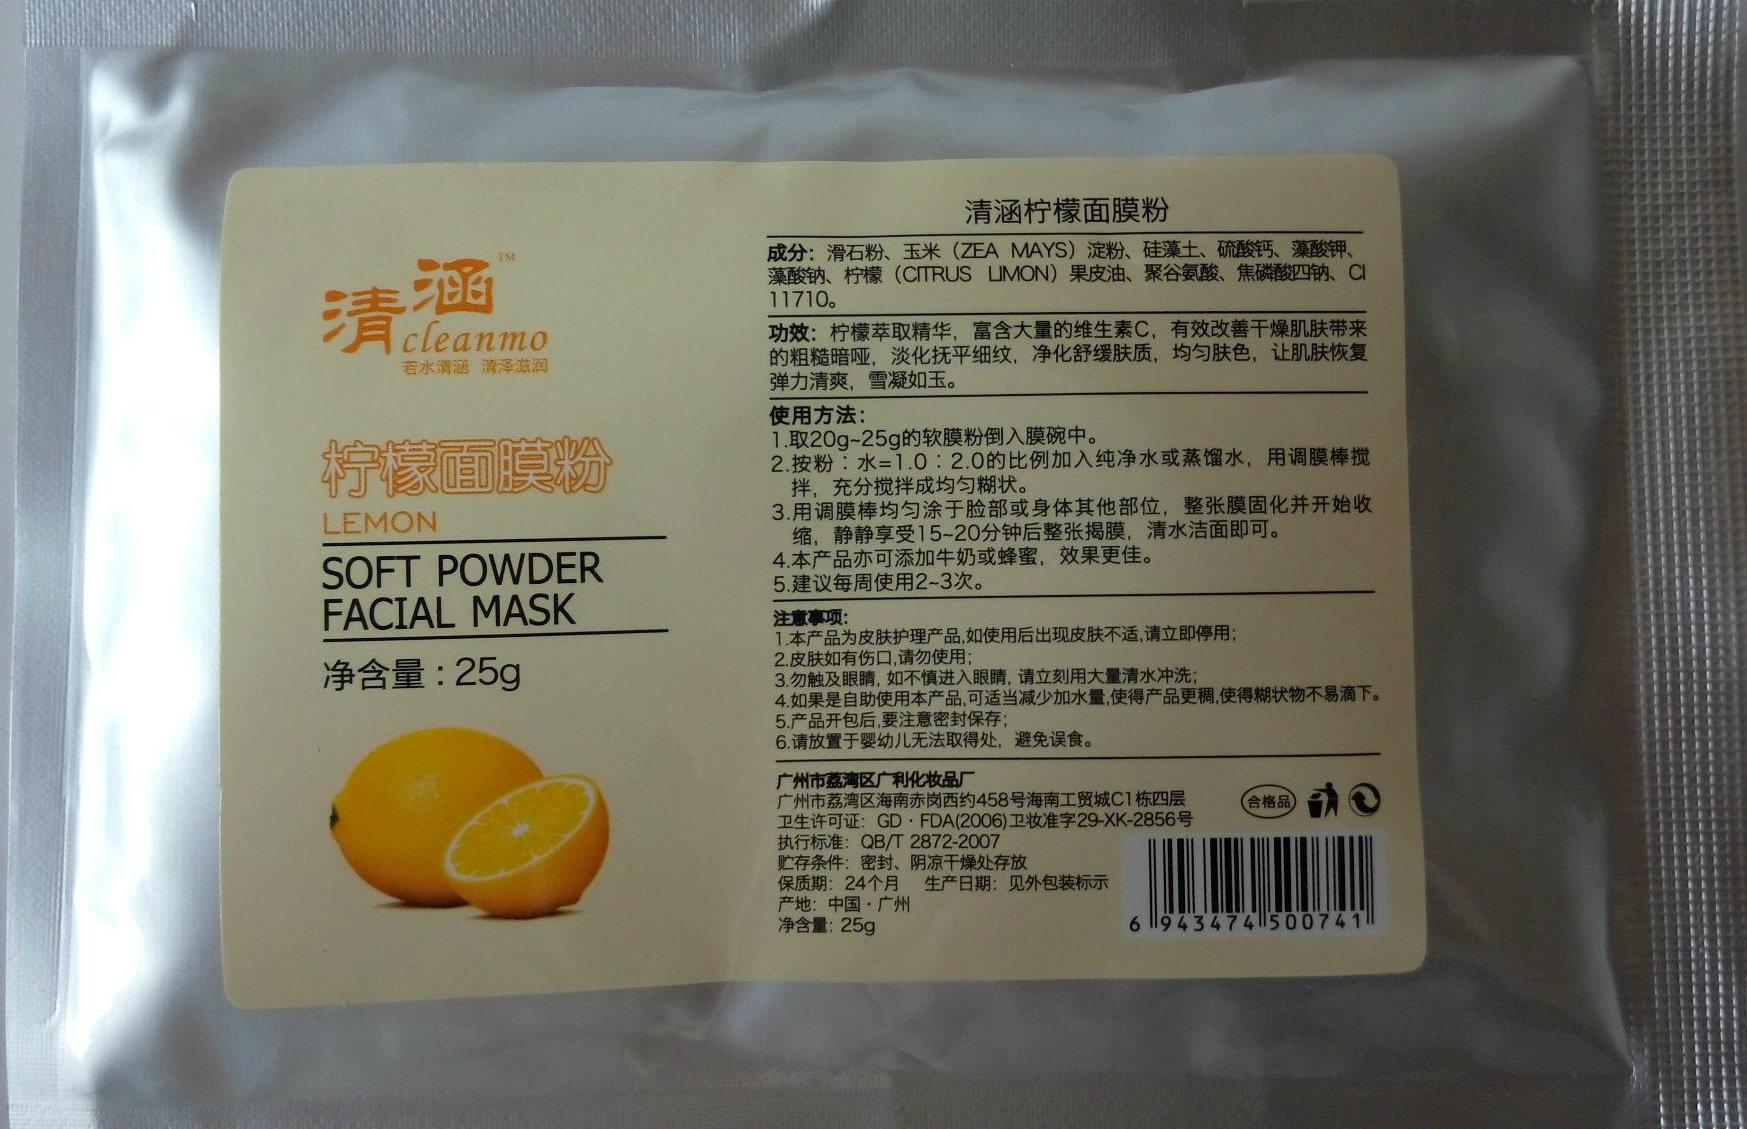 Anti-Wrinkle Lighten and Even Skin Tone Rich in Vitamin C Lemon Mask